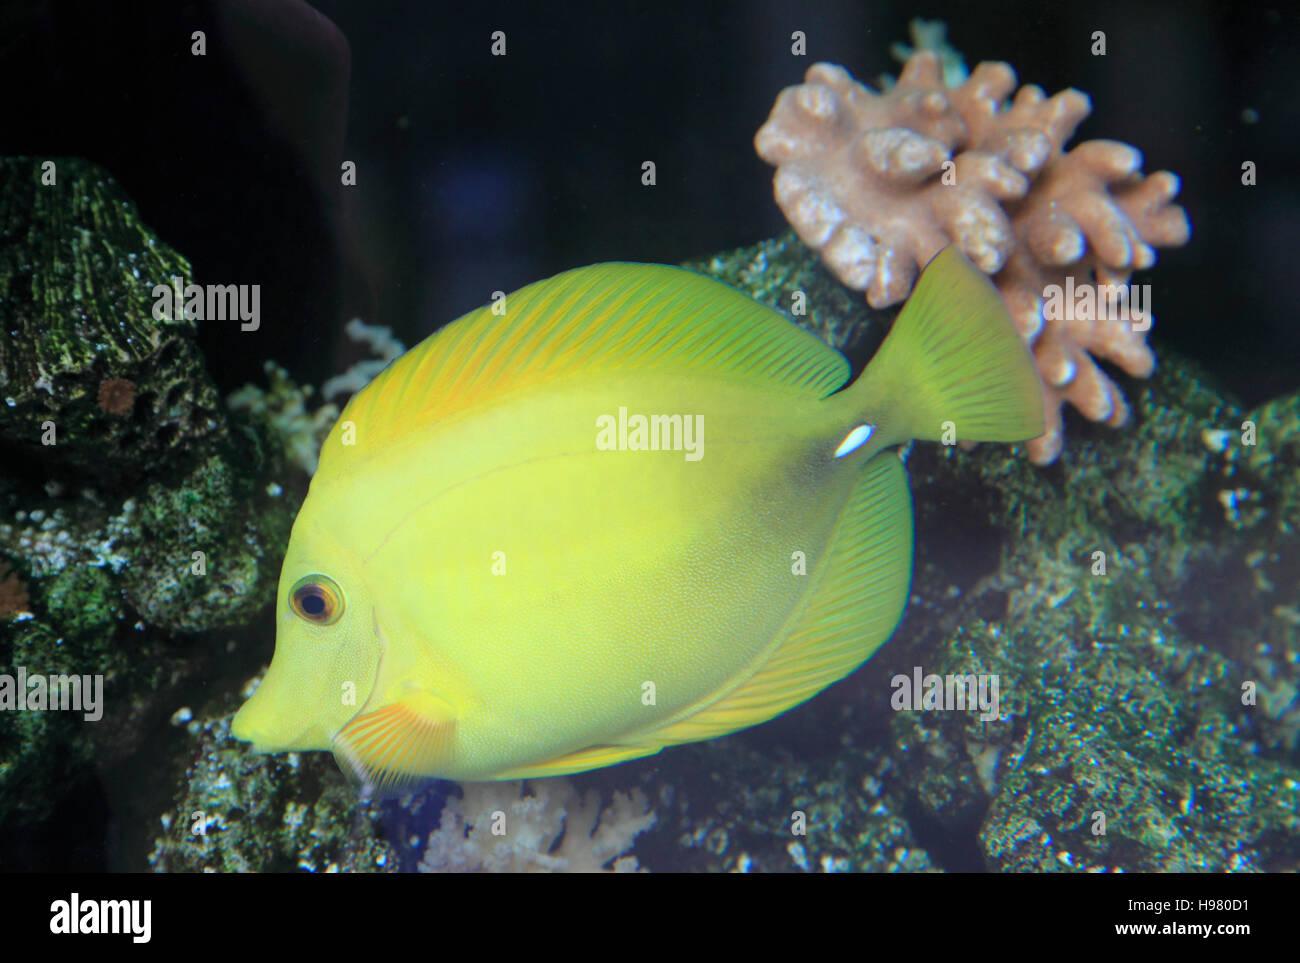 Japan Tokyo Aquarium Fish Stock Photo 126180461 Alamy